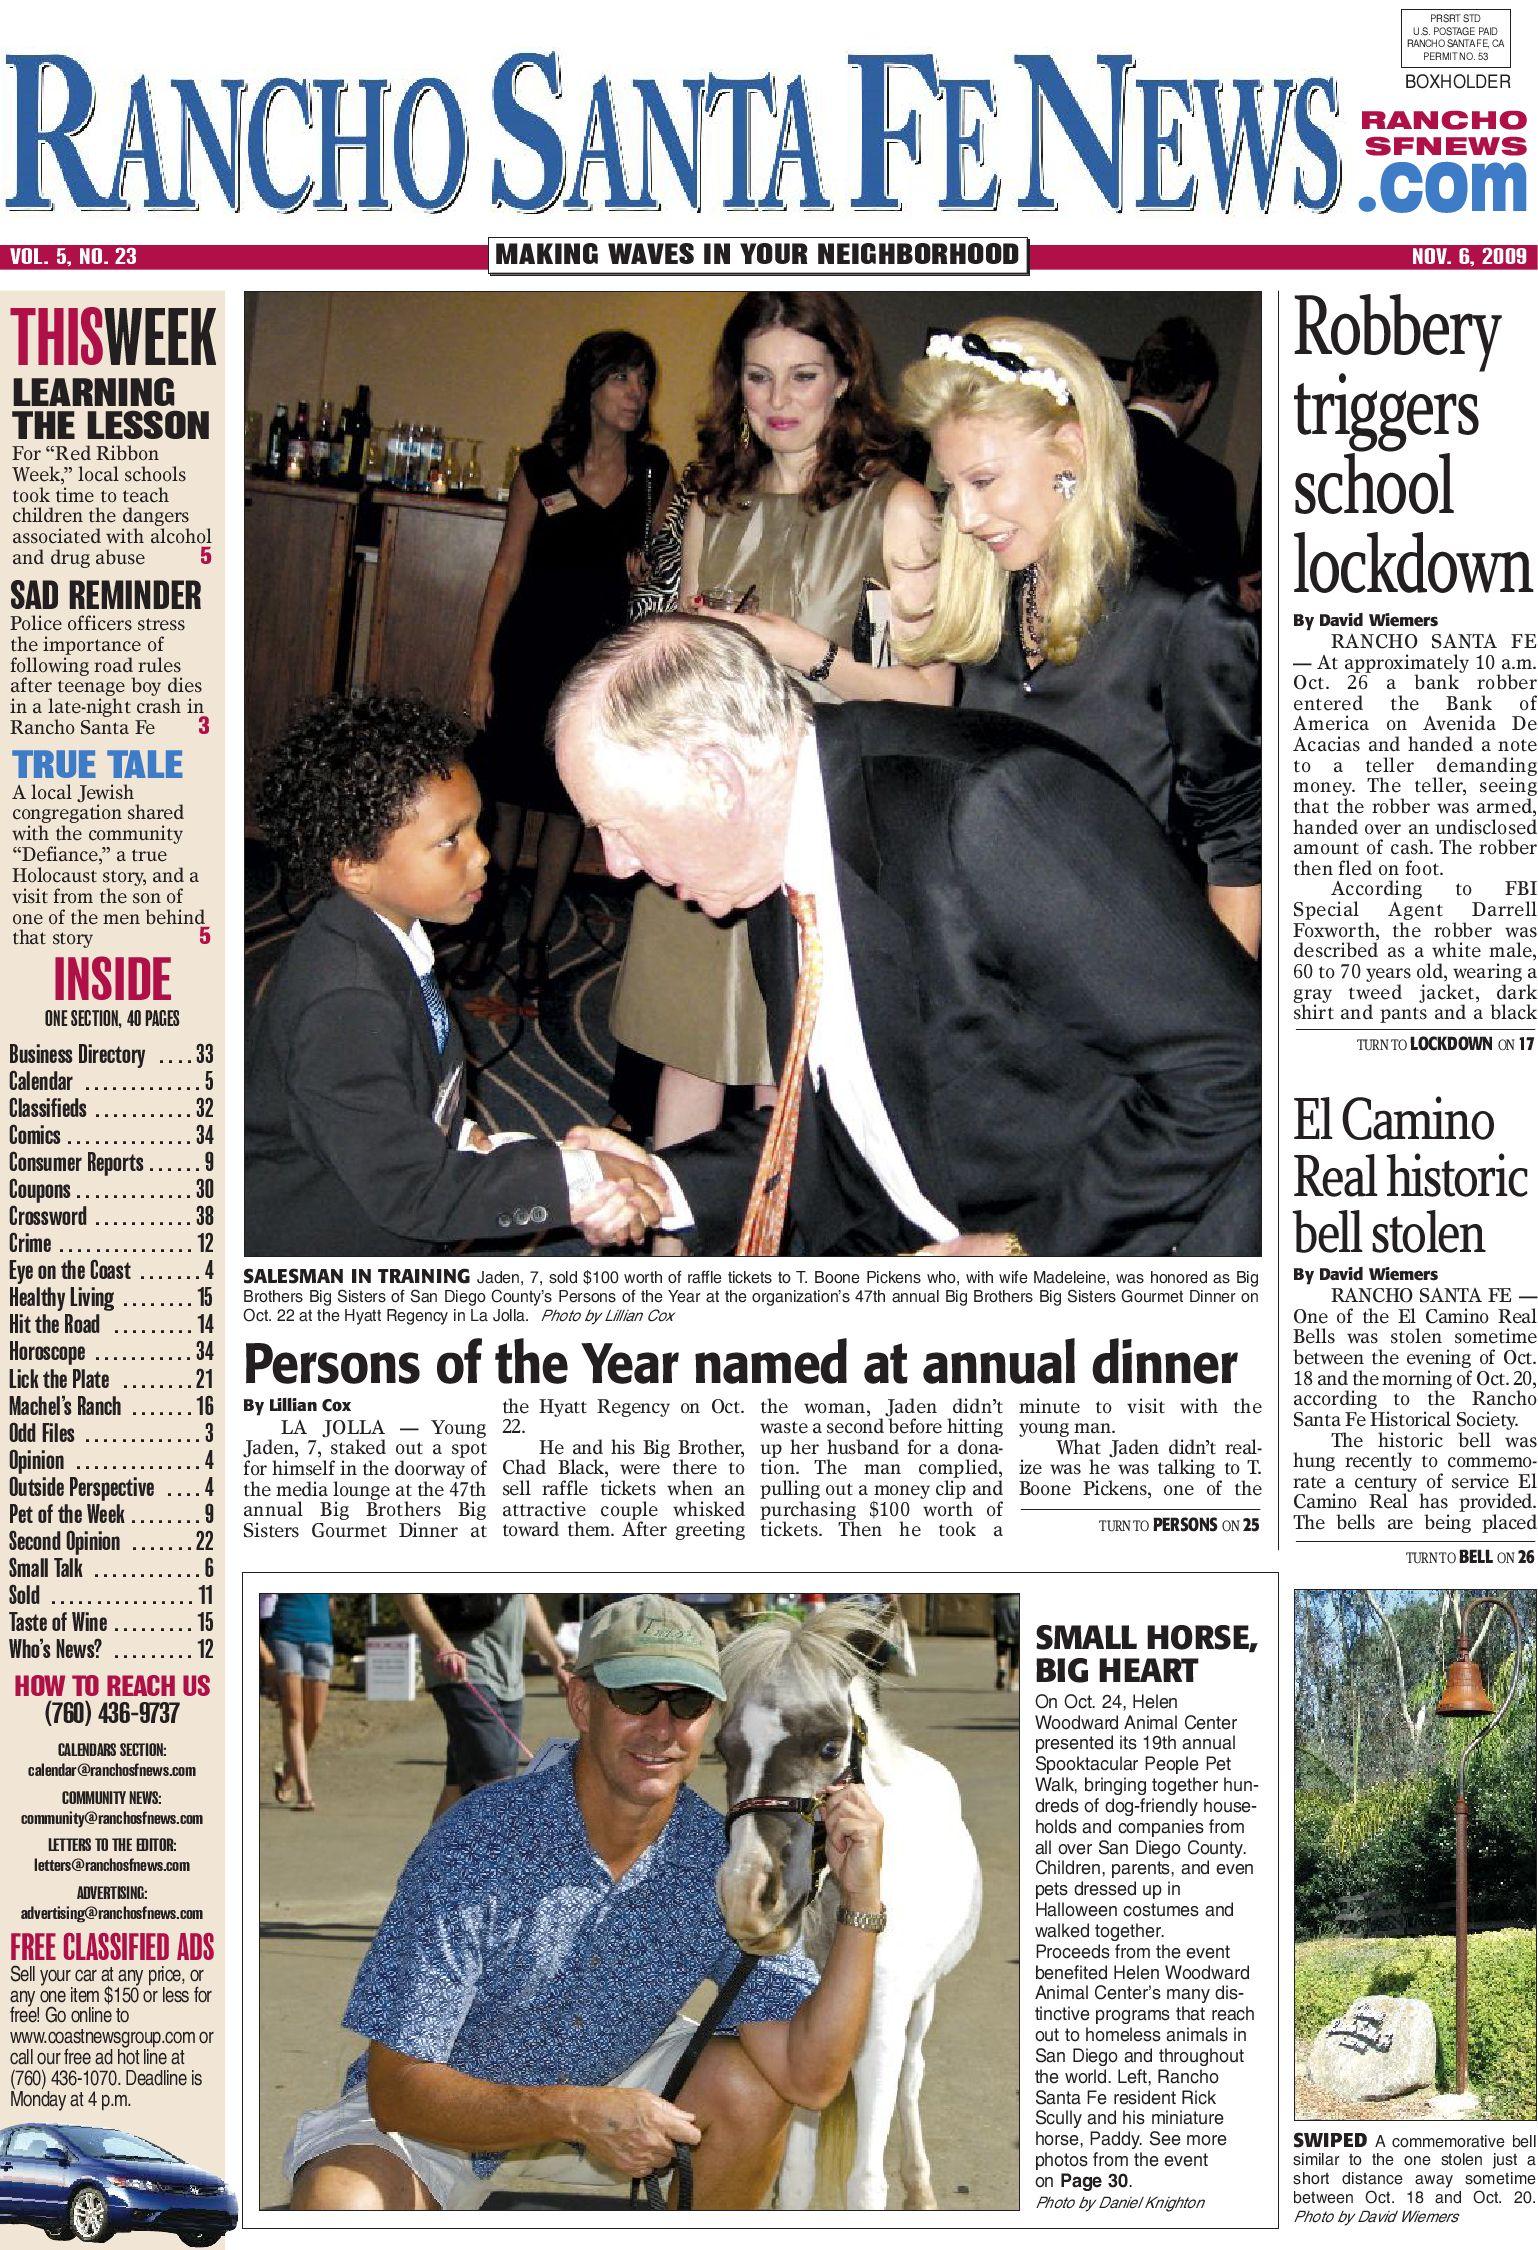 Santa Fe News >> Rancho Santa Fe News Nov 6 2009 Web By Coast News Group Issuu